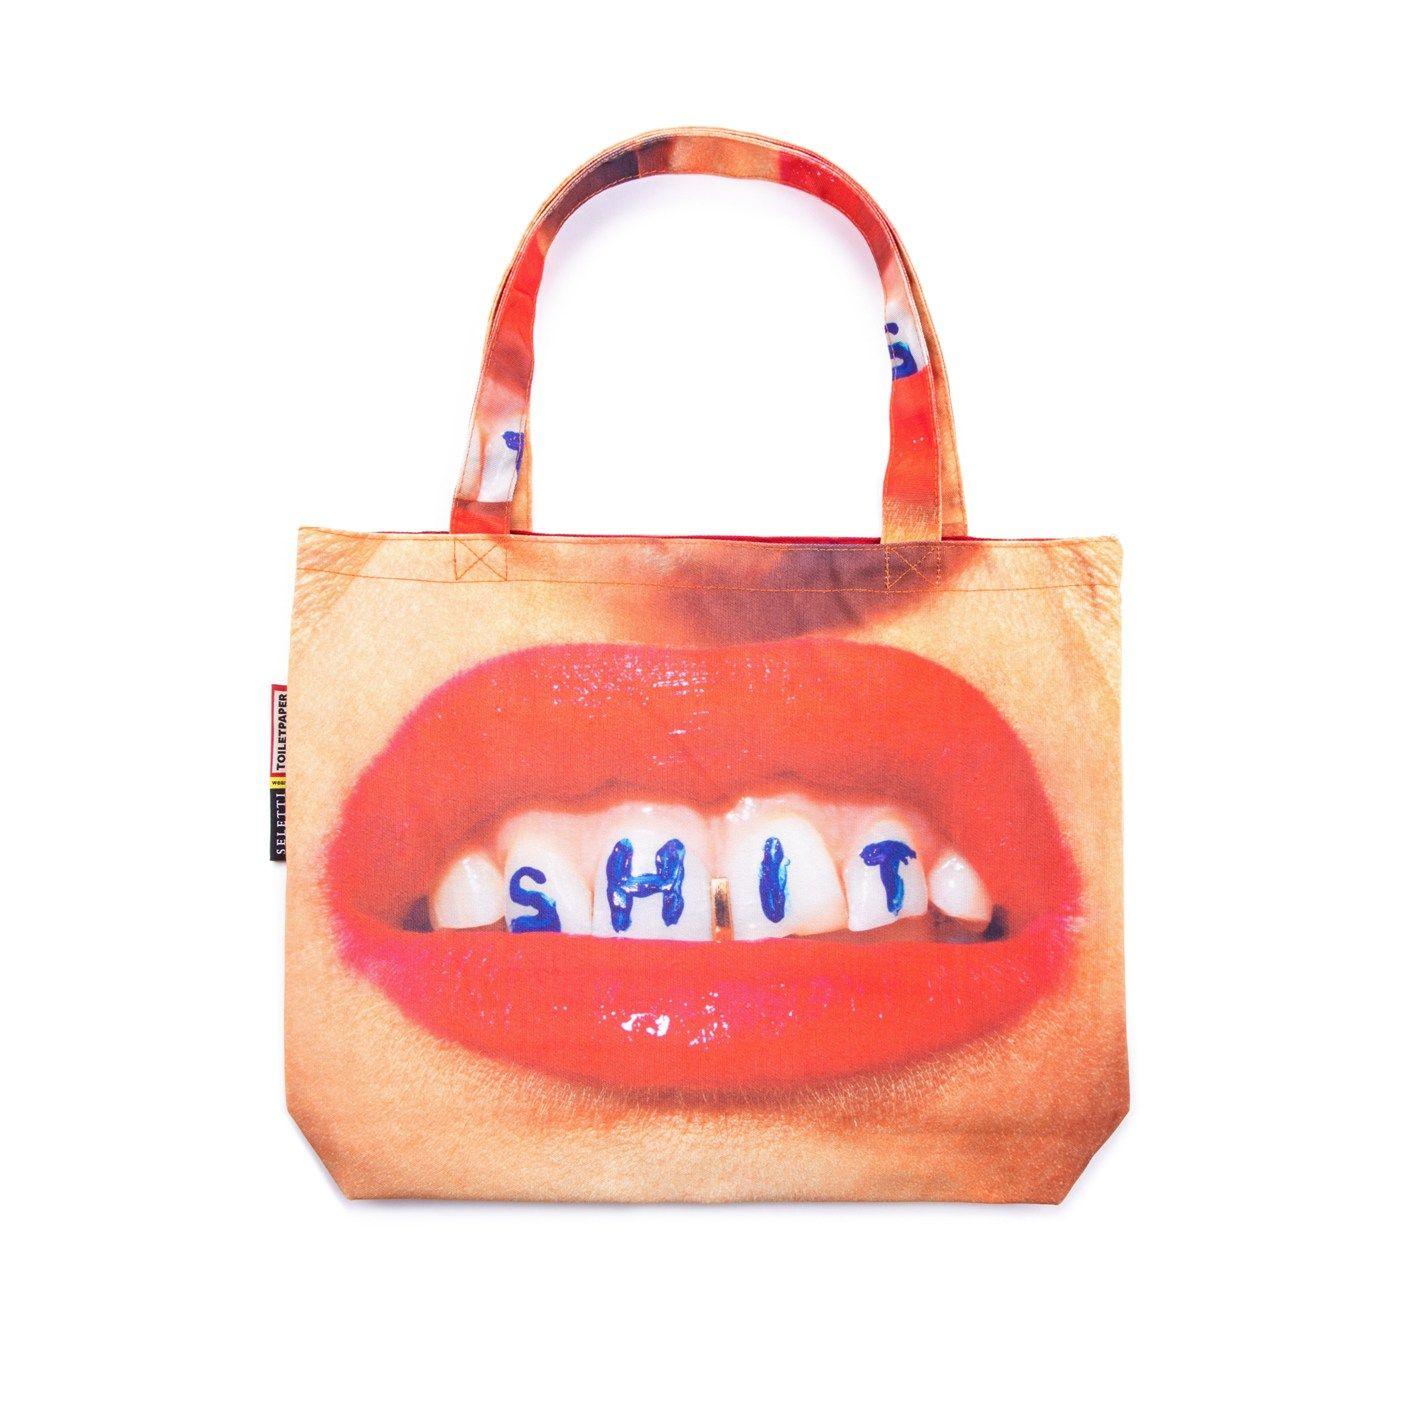 Seletti a maison objet 2016 for Seletti catalogo